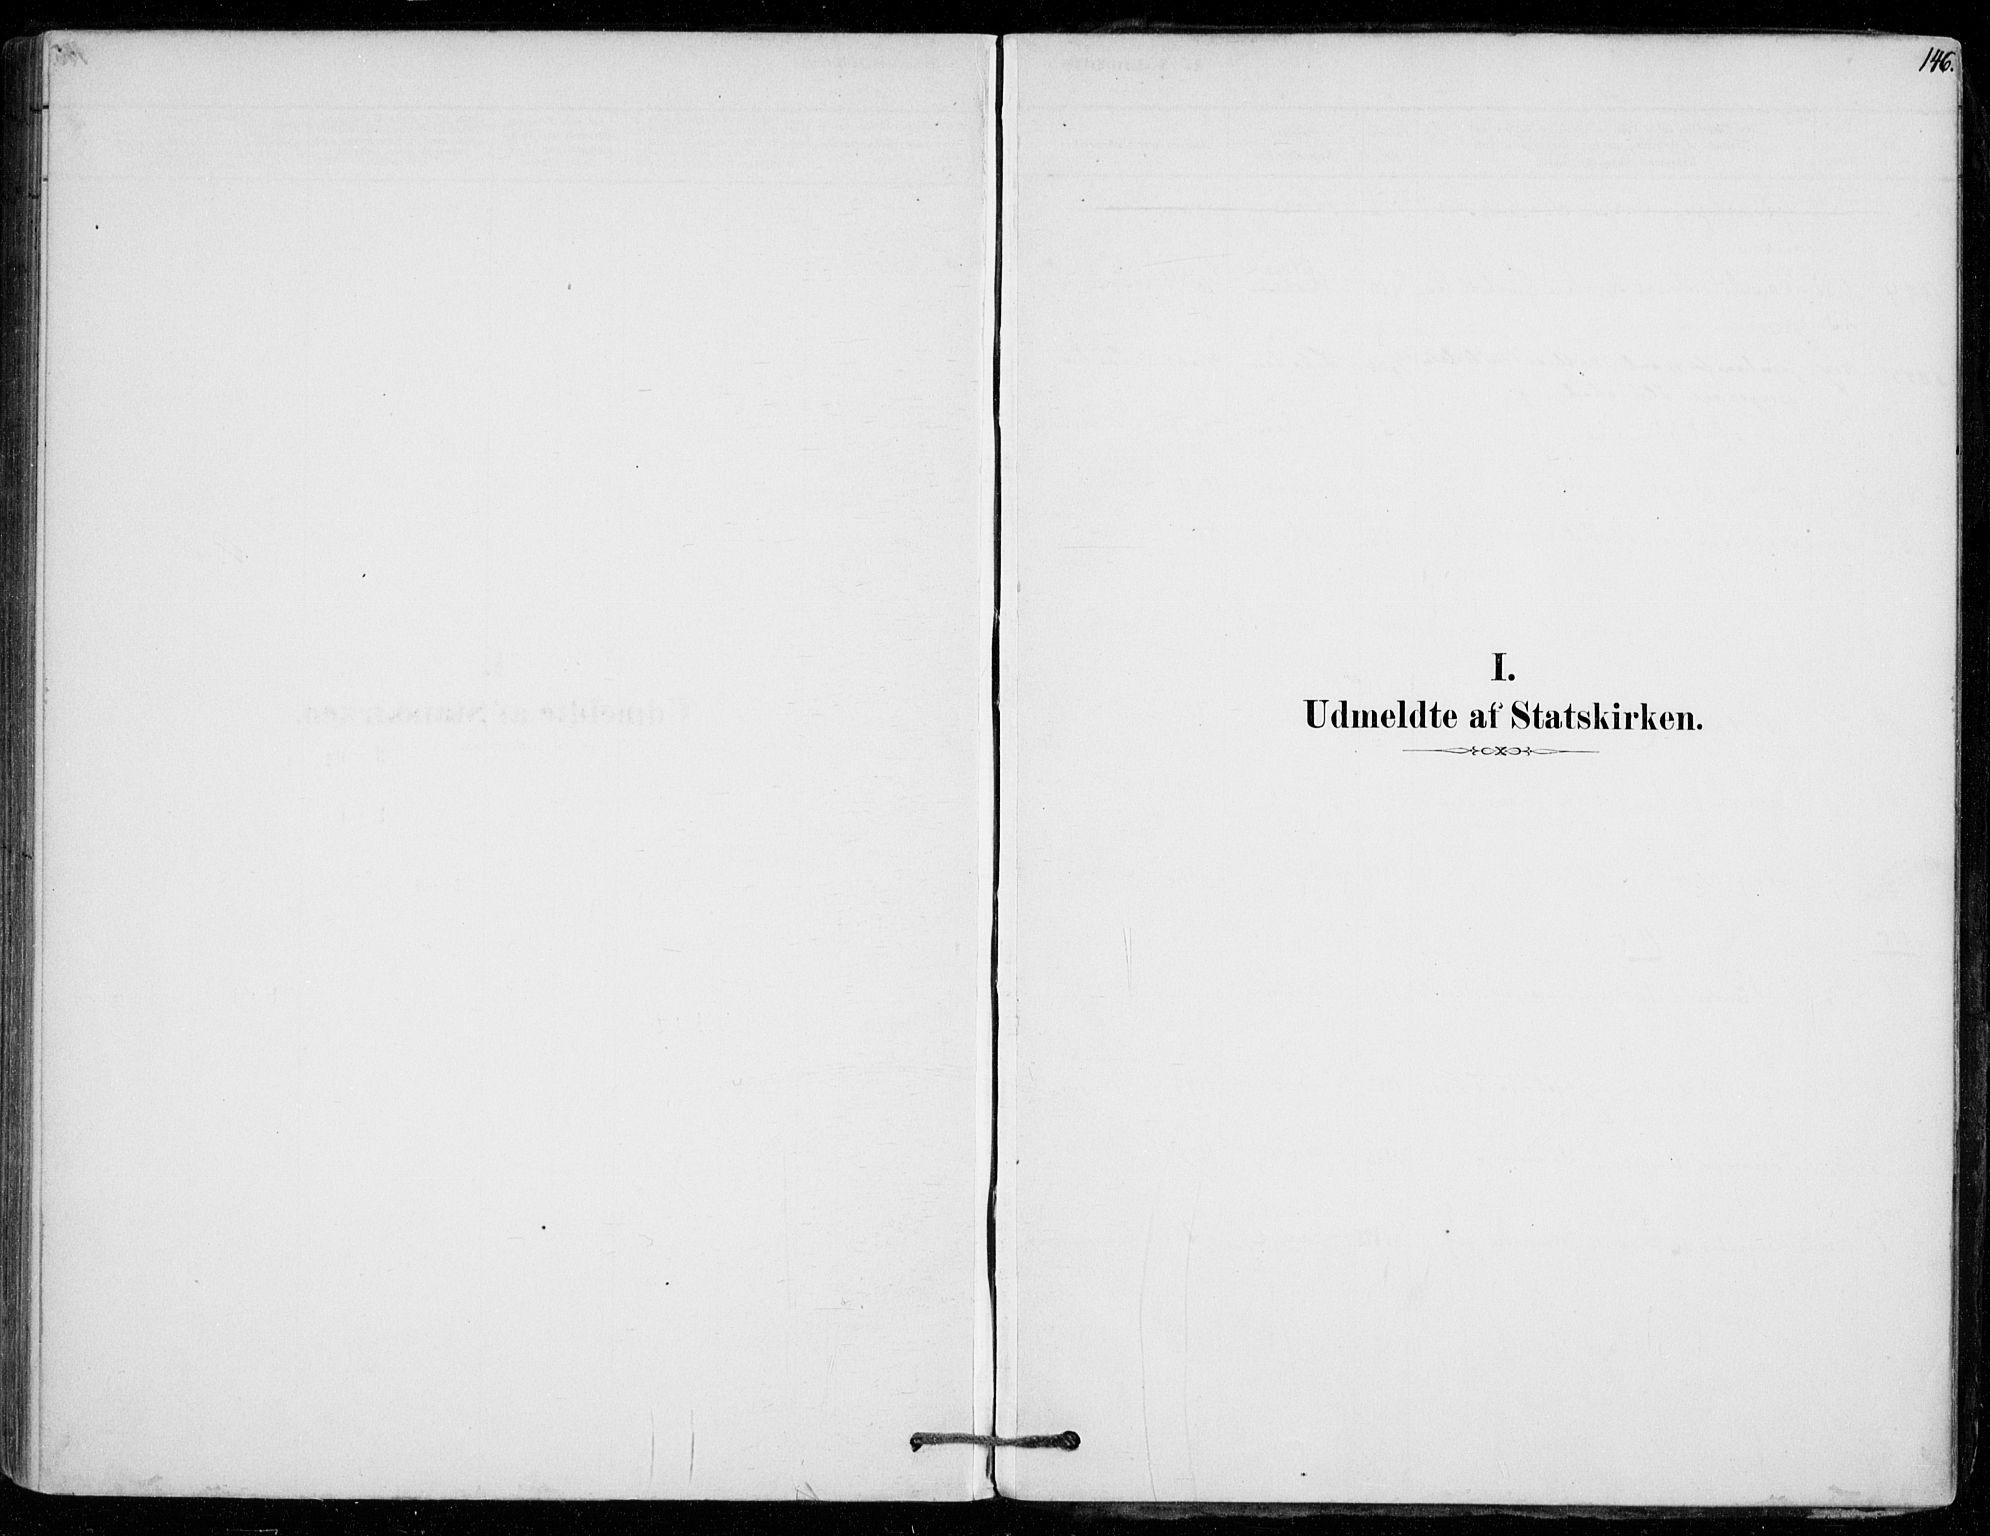 SAO, Vestby prestekontor Kirkebøker, F/Fe/L0001: Ministerialbok nr. V 1, 1878-1931, s. 146